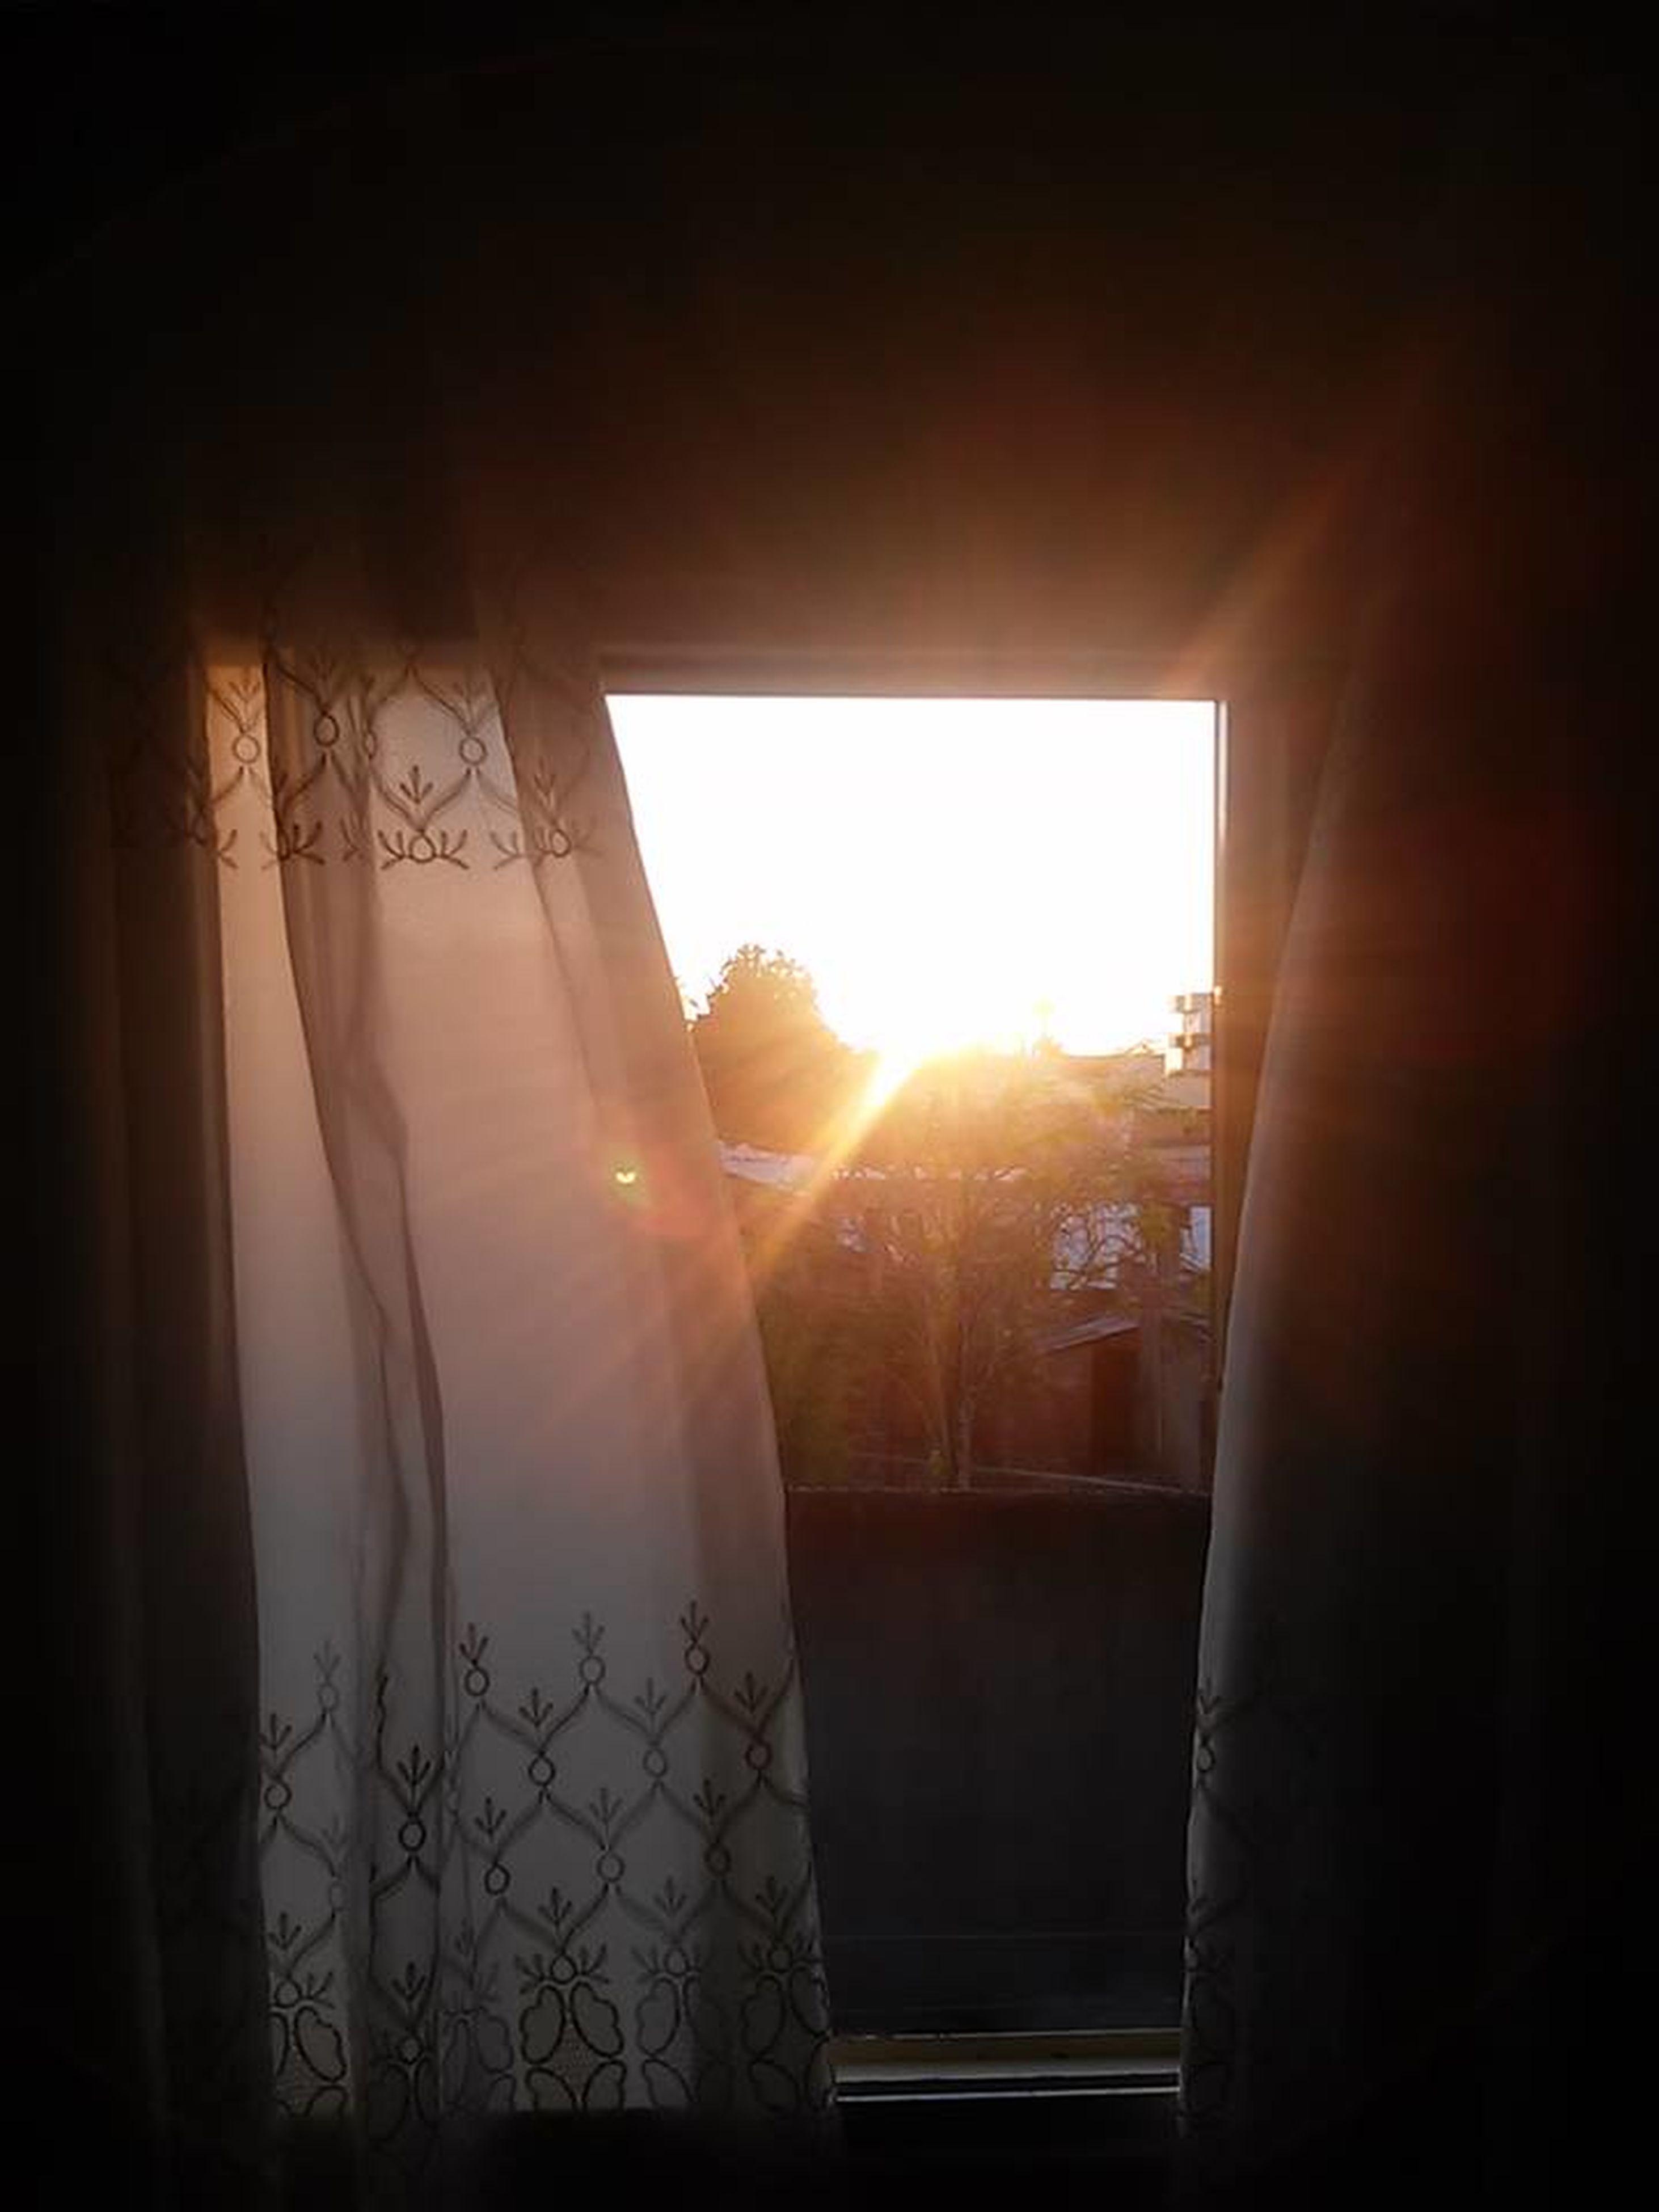 window, sunlight, sun, sunset, indoors, domestic room, sunbeam, no people, day, sky